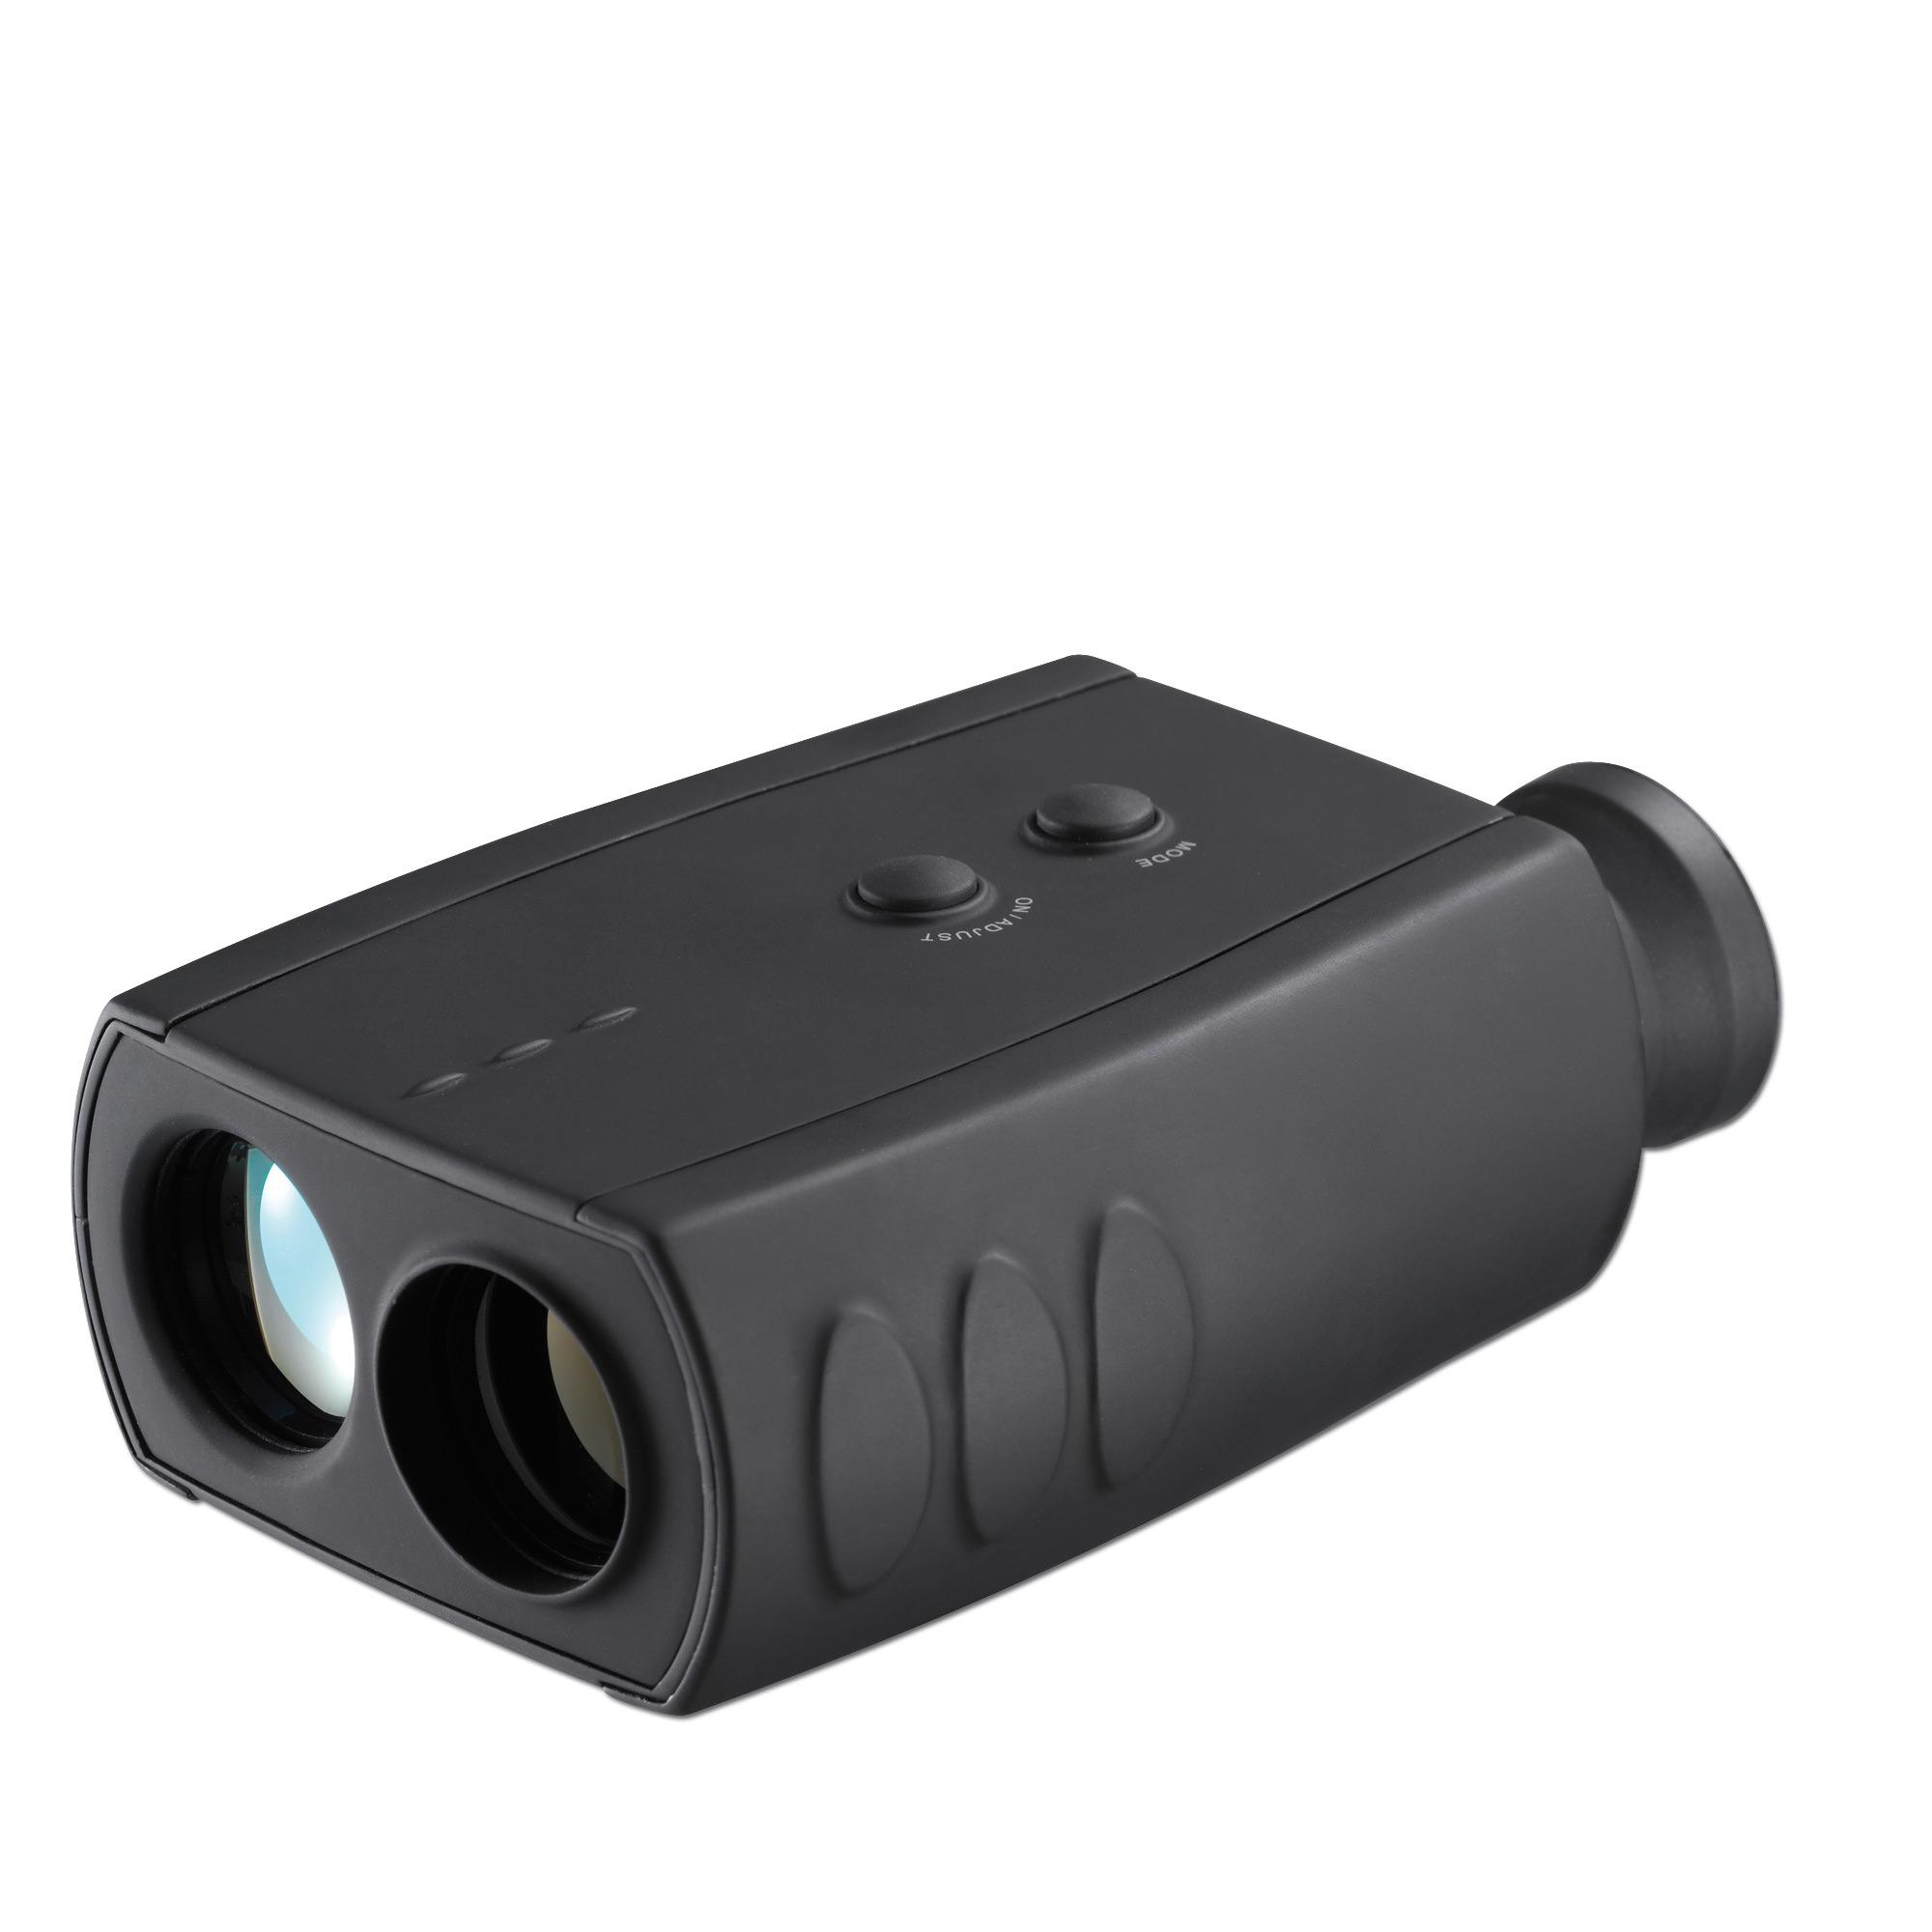 Walther laser range finder LRF 800